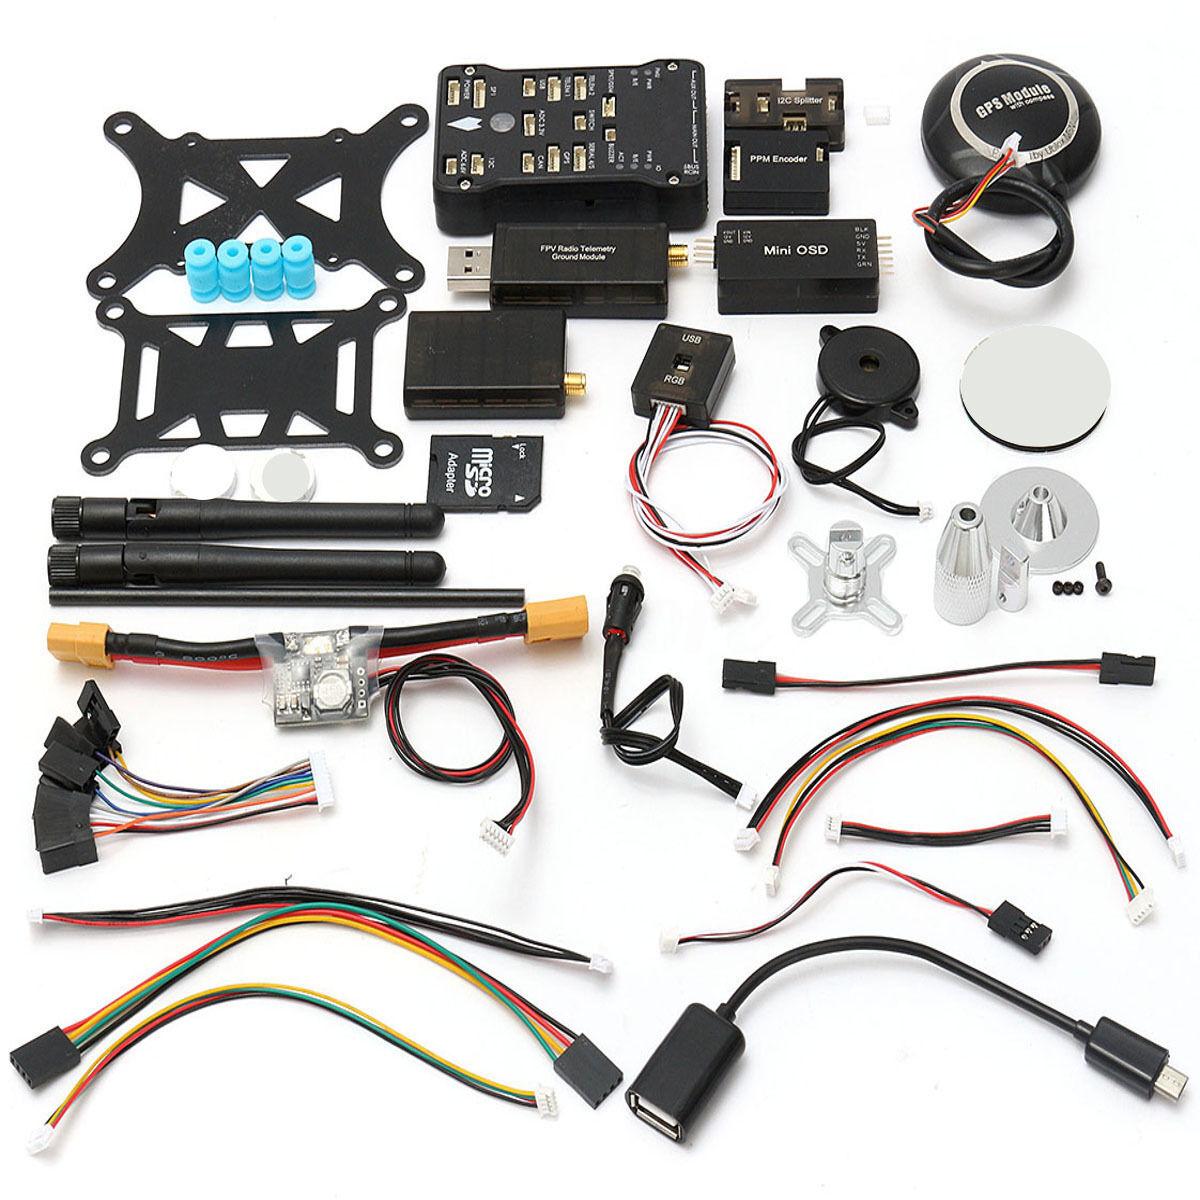 Pixhawk PX4 2.4.8 32bit Flight Controller NEO-M8N GPS Radio ...